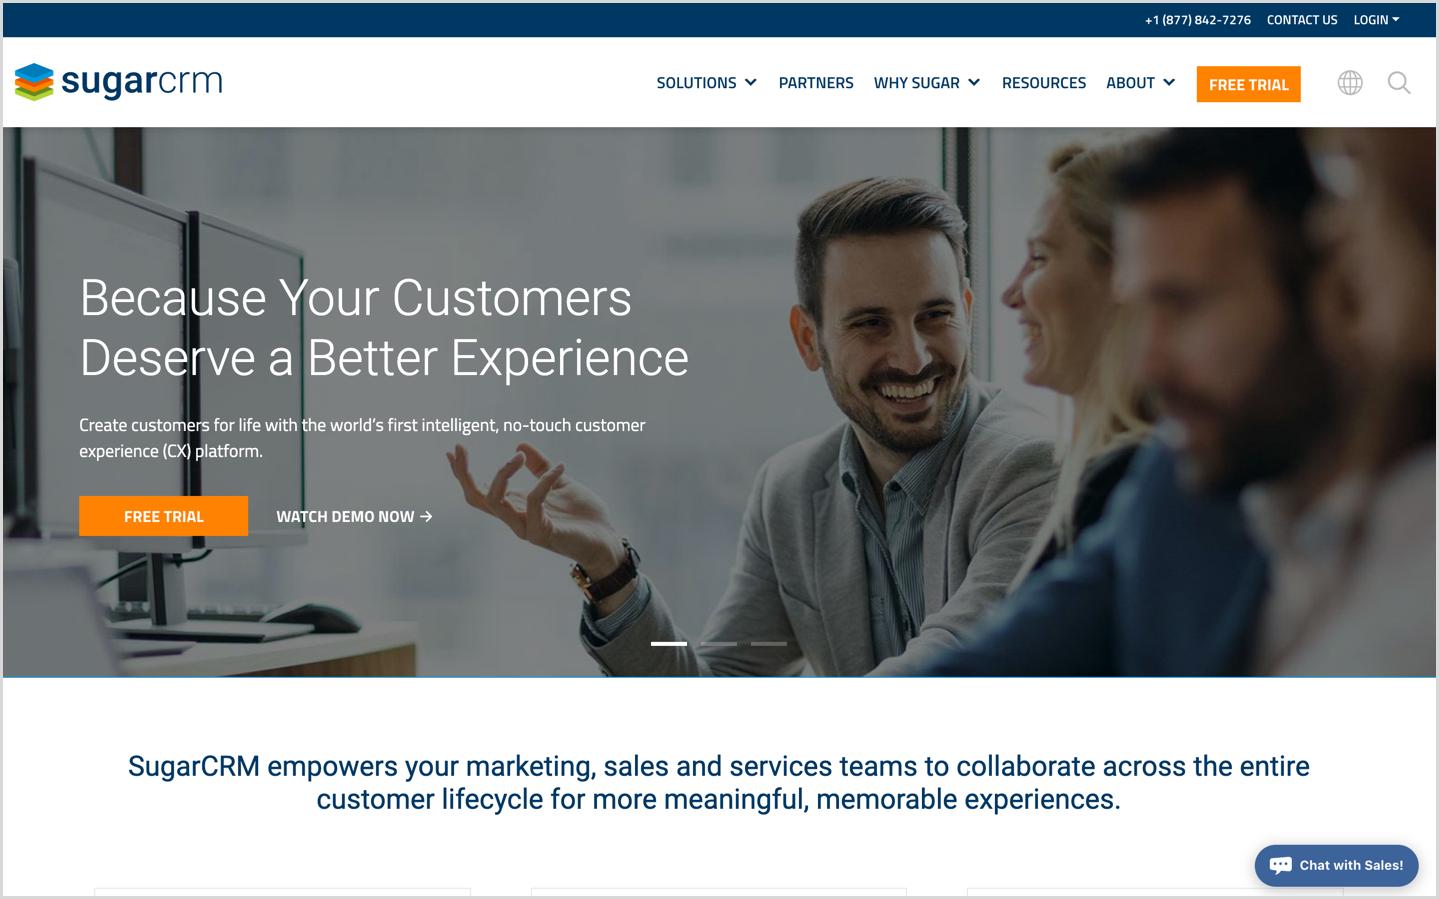 SugarCRM Homepage